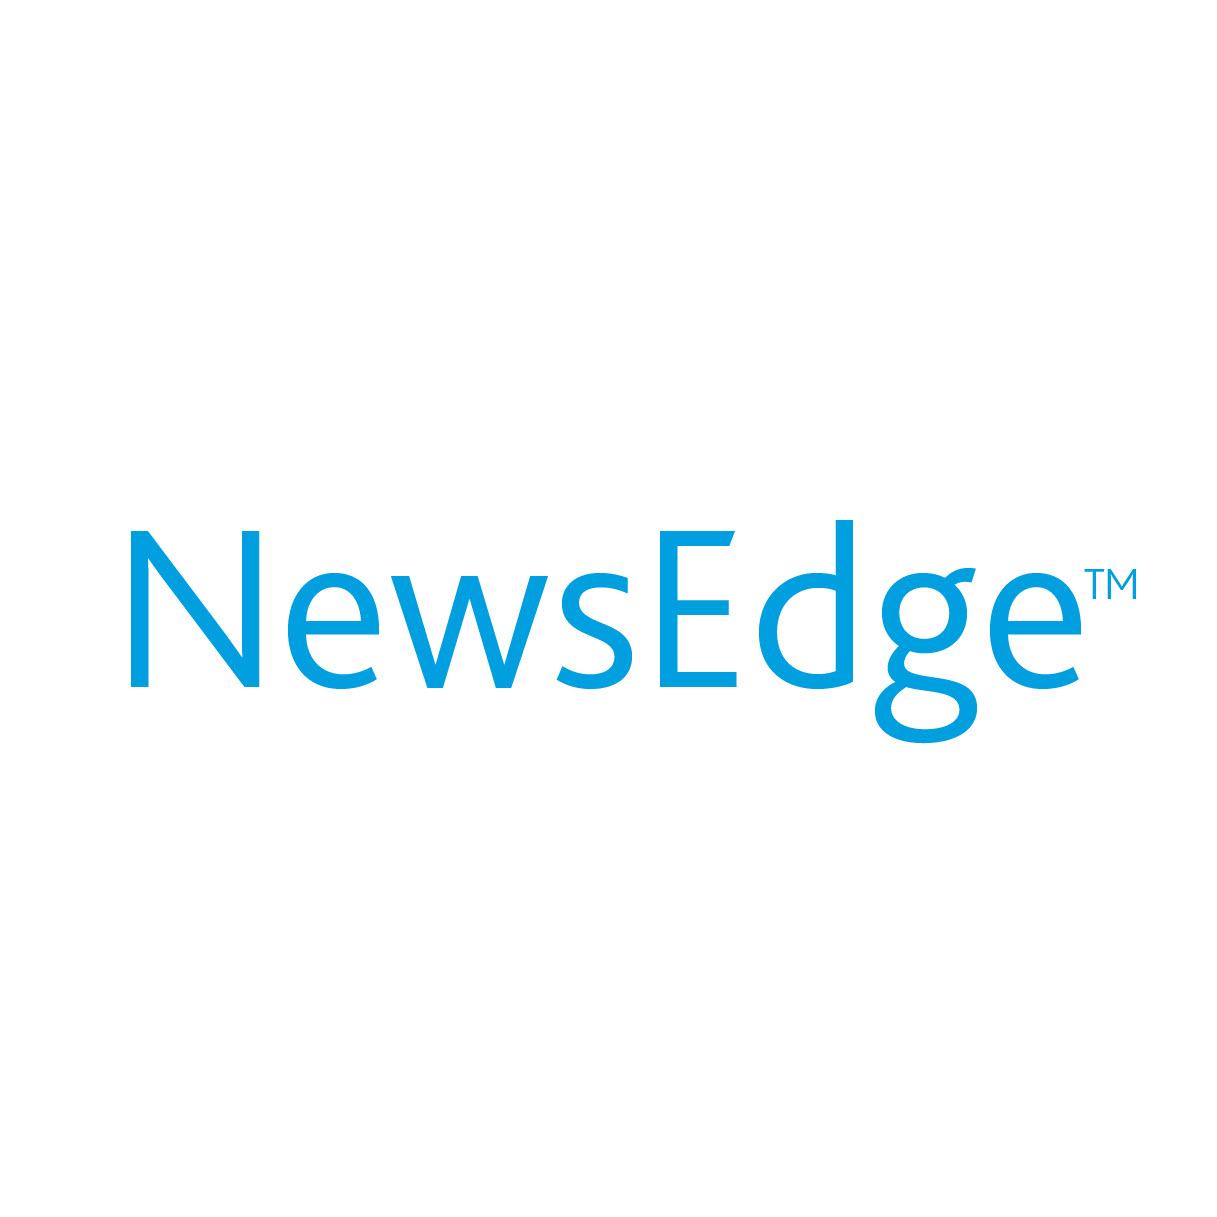 NewsEdge™